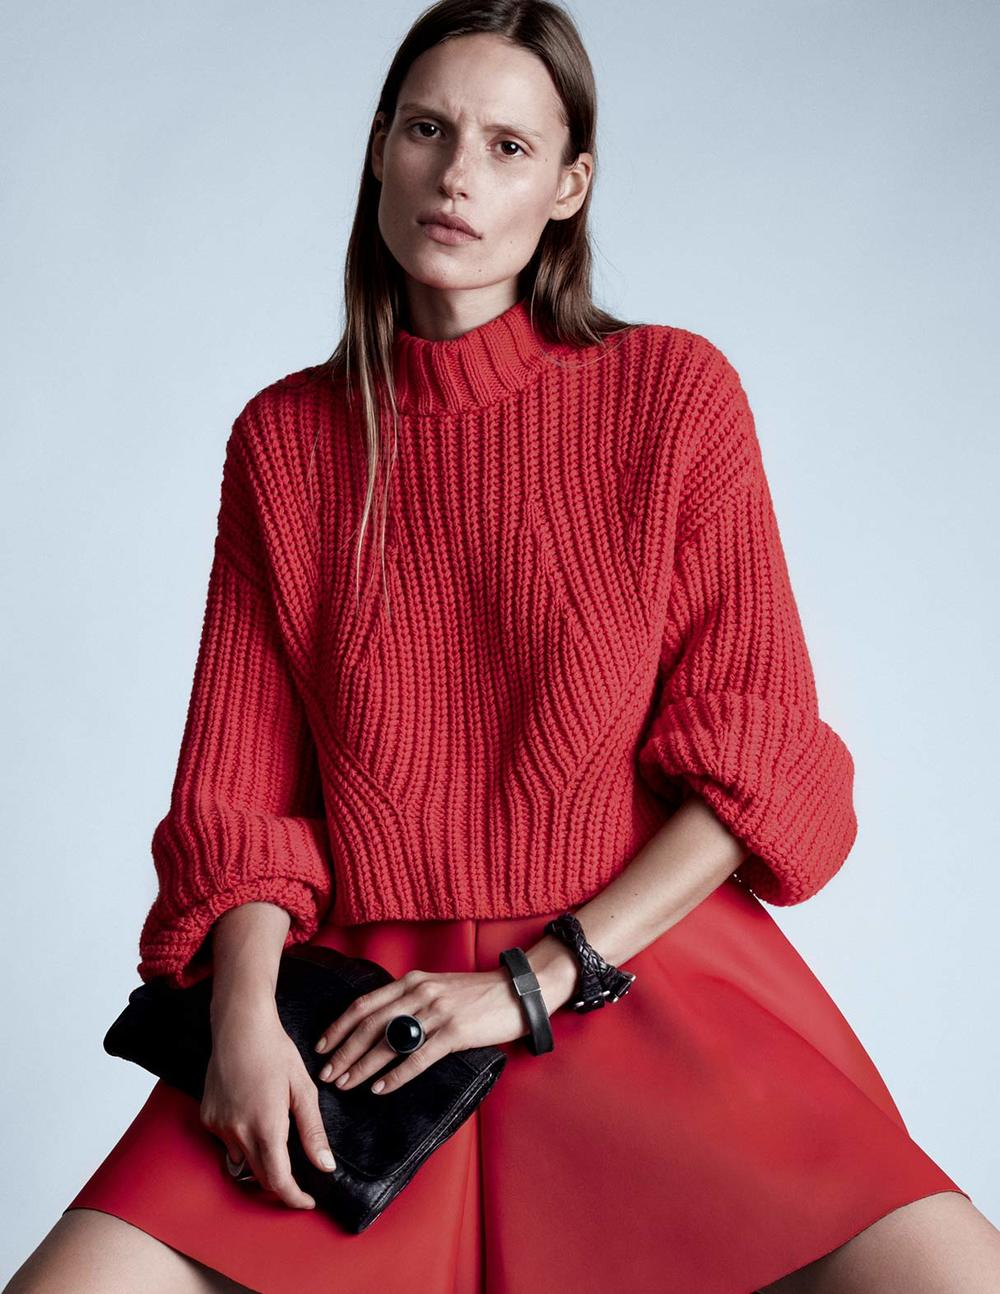 120-model-interview-Cate-Underwood-1.jpg